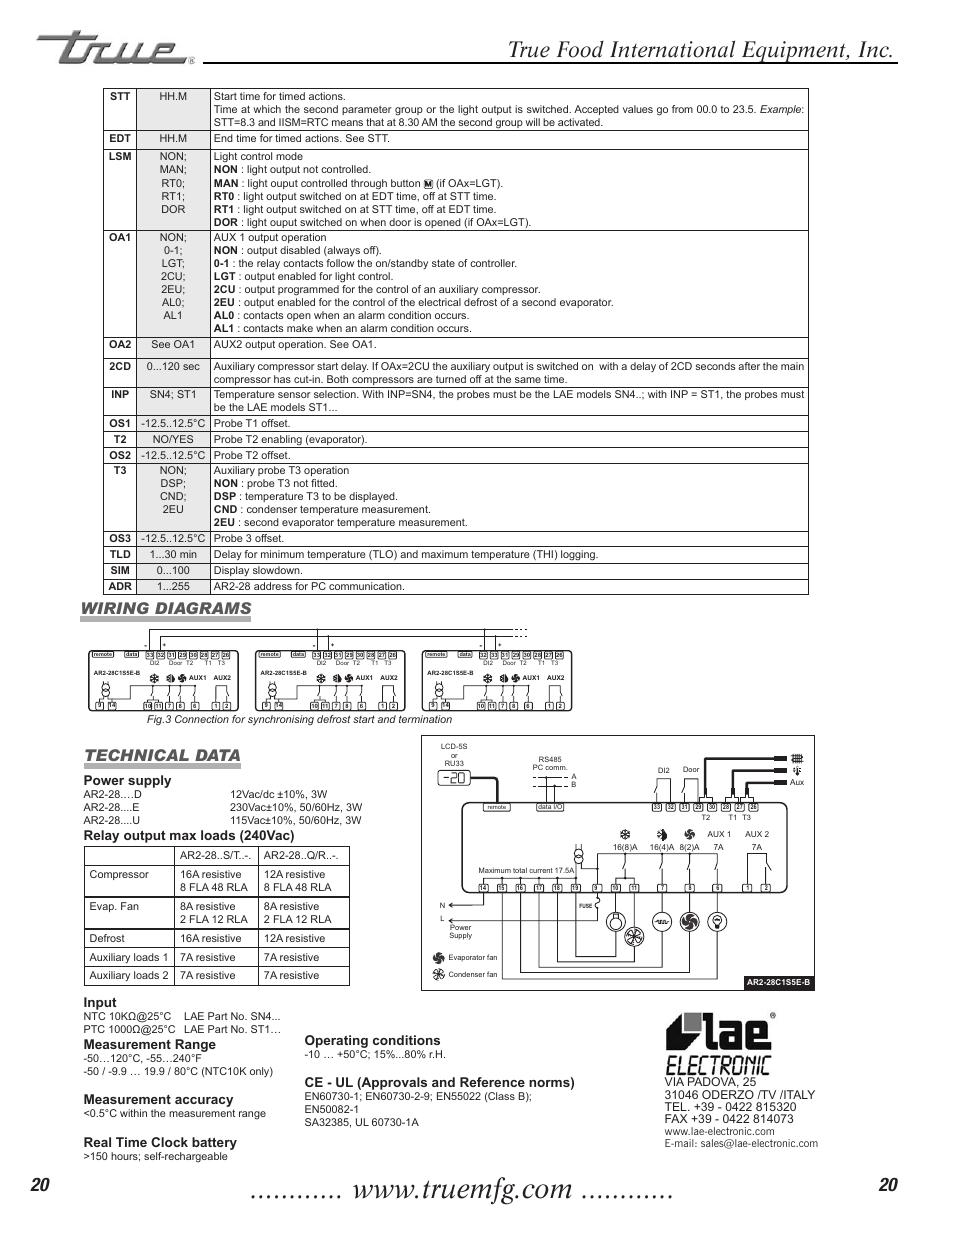 true food international equipment inc ar2 28 instructions for use rh manualsdir com true manufacturing t-23f wiring diagram True Refrigerator Parts Diagram